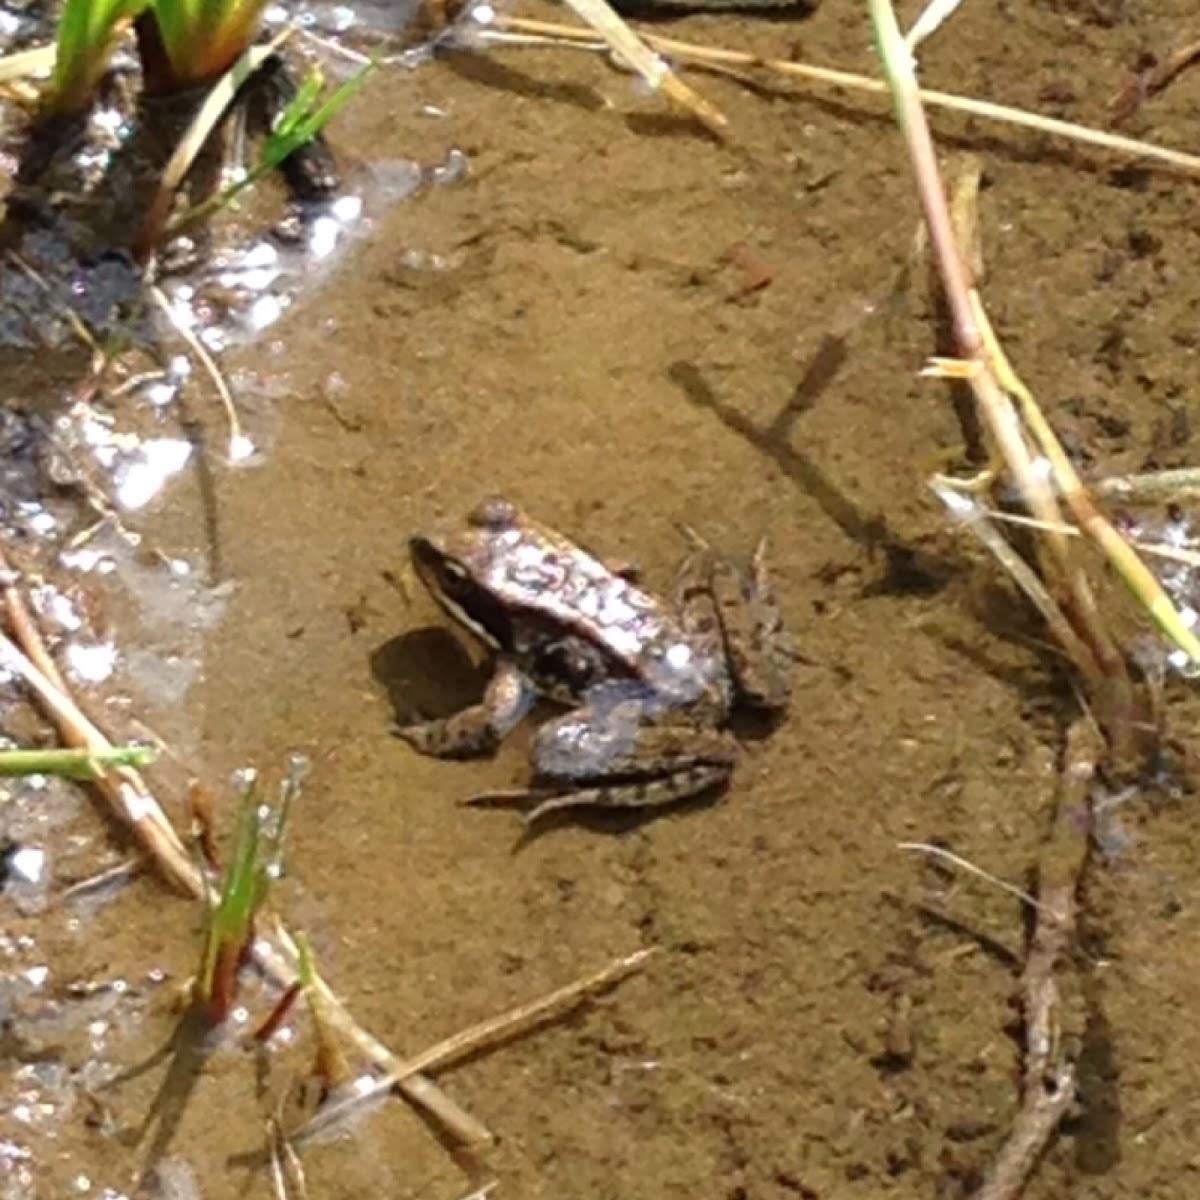 Cascades frog